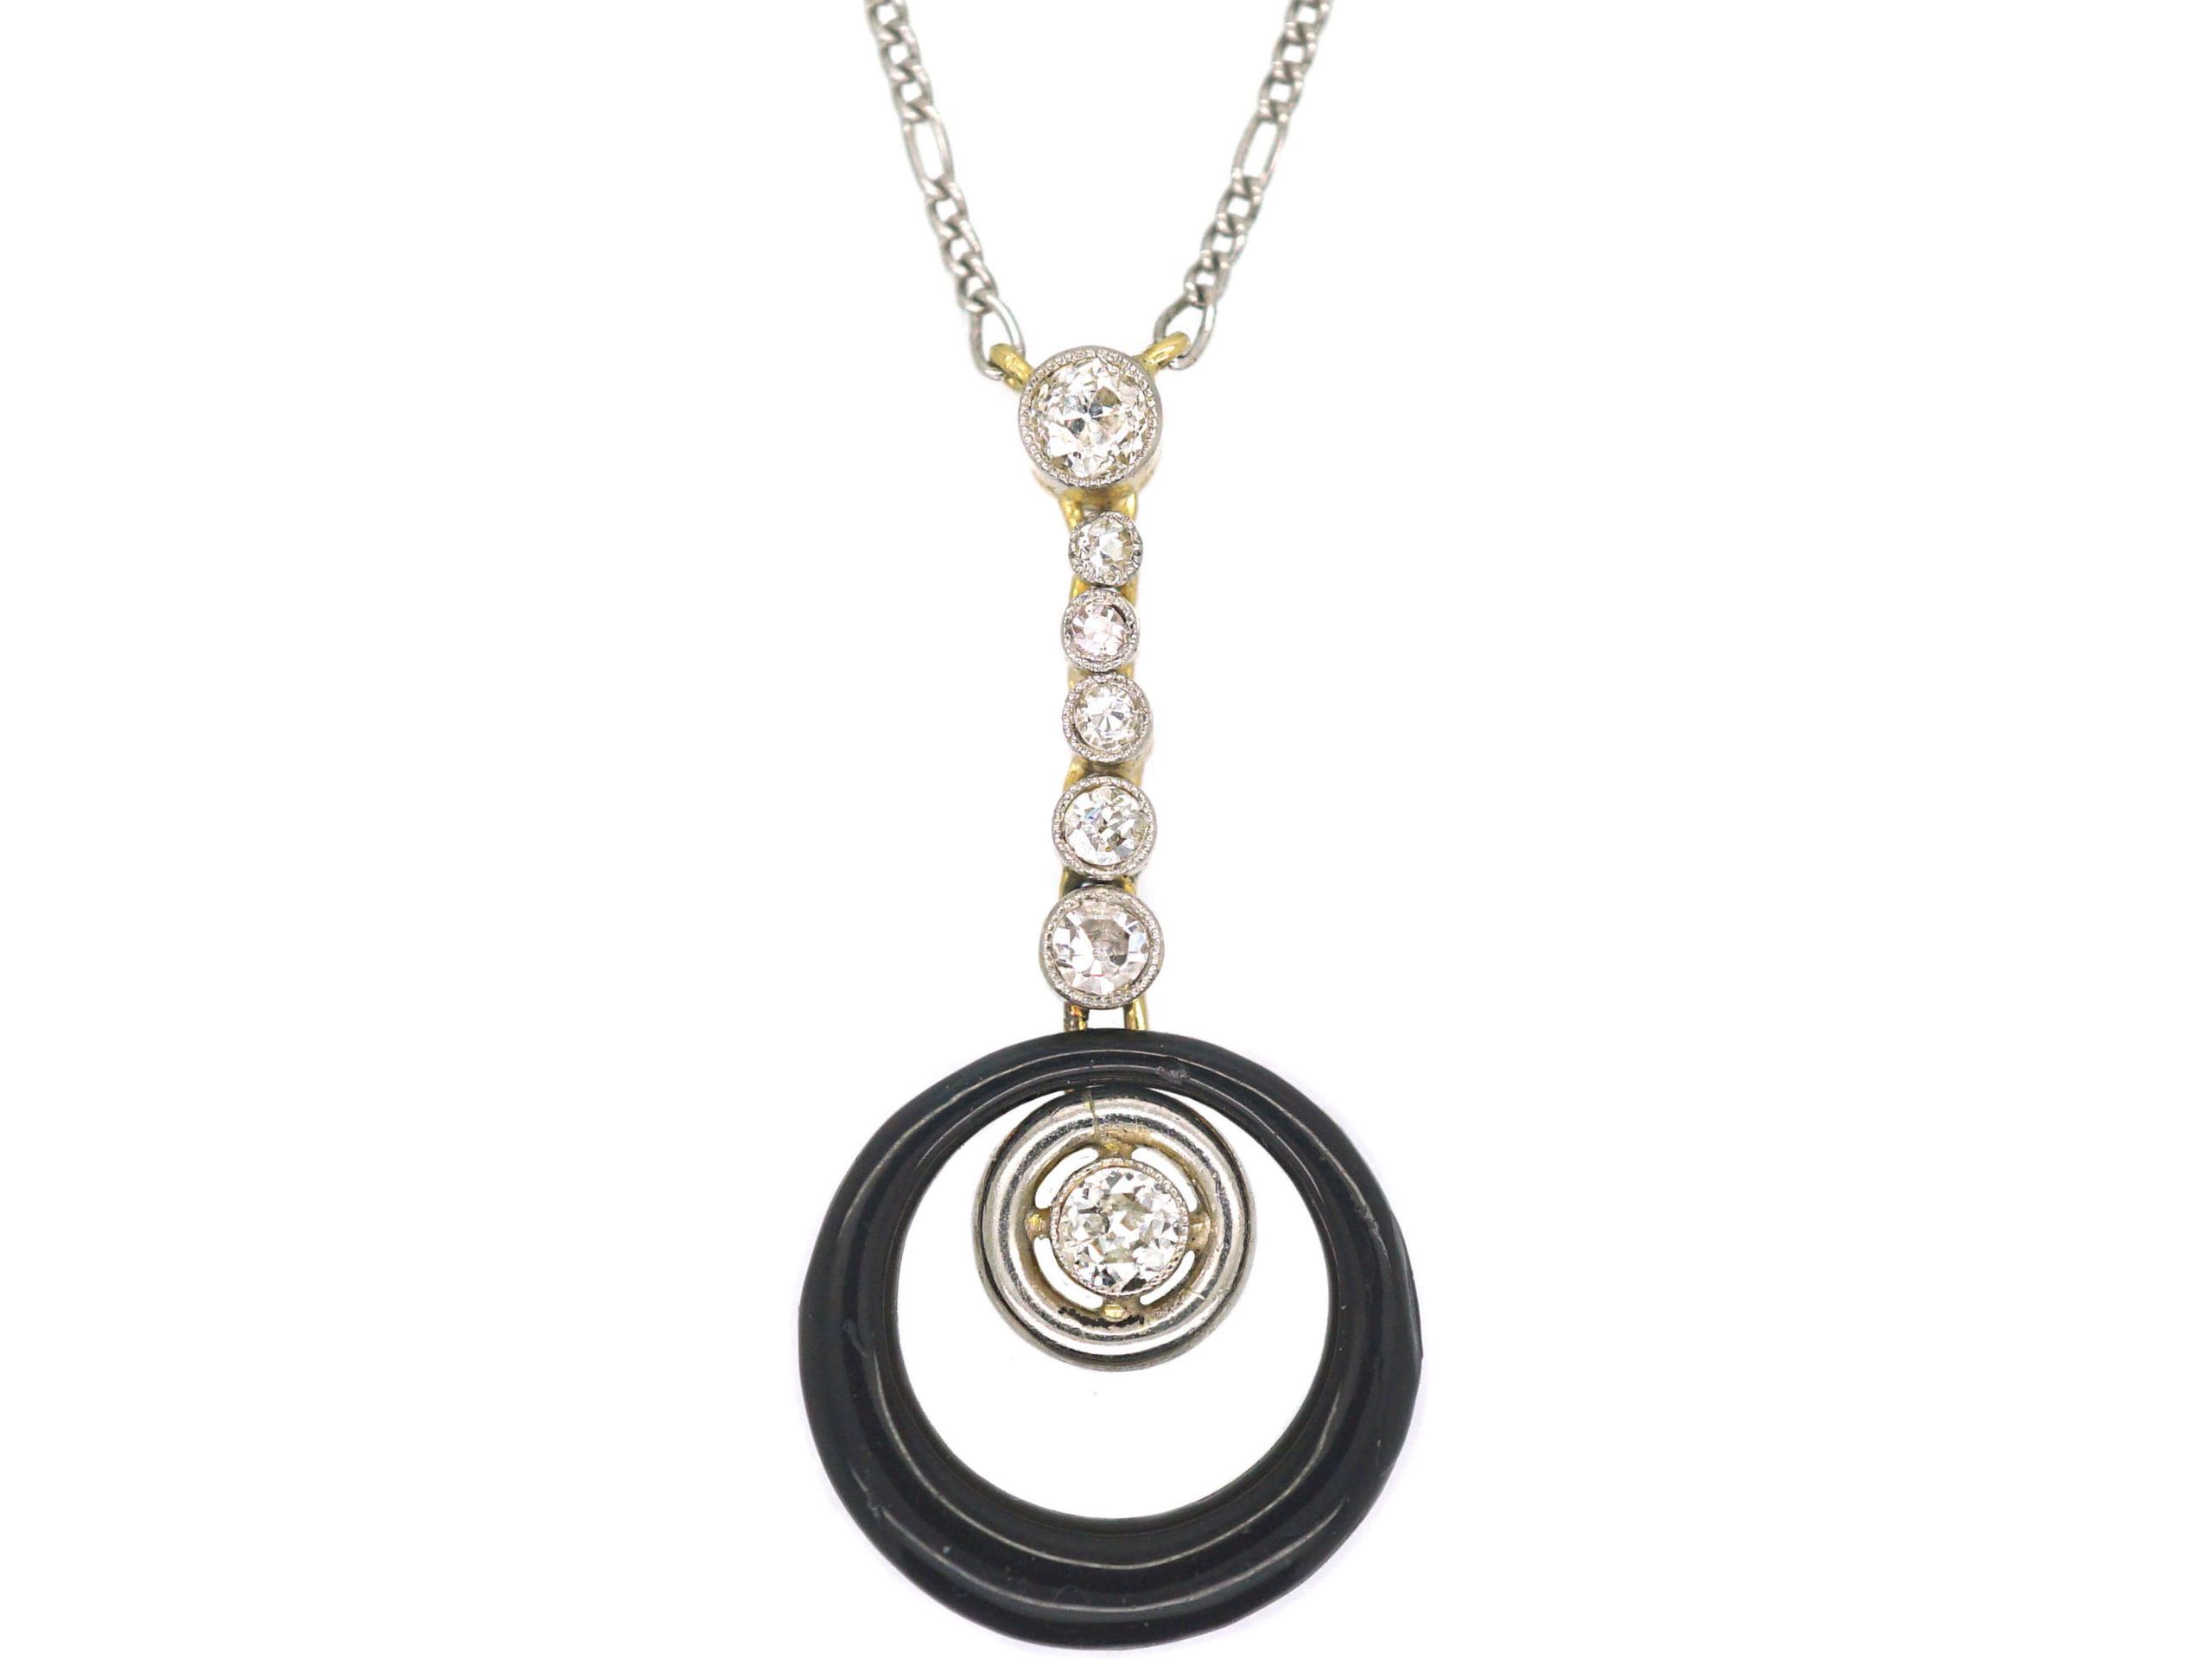 Art Deco 18ct Gold & Platinum, Diamond & Black Enamel Pendant